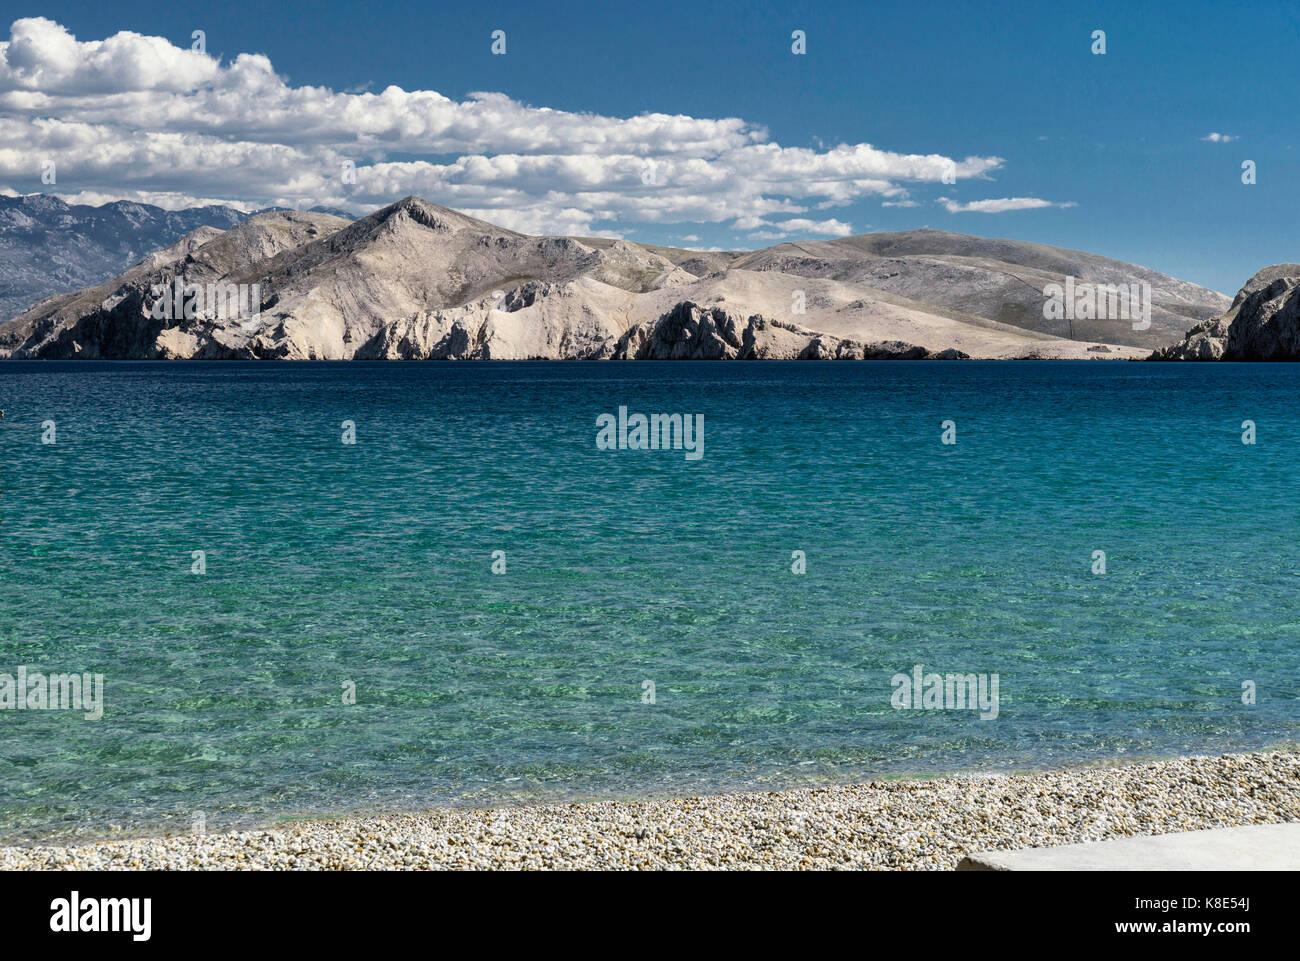 Croatia, Kvarner bay, island Privic in the view of Baska, Kroatien, Kvarner Bucht, Insel Privic in der Ansicht von Baska Stock Photo